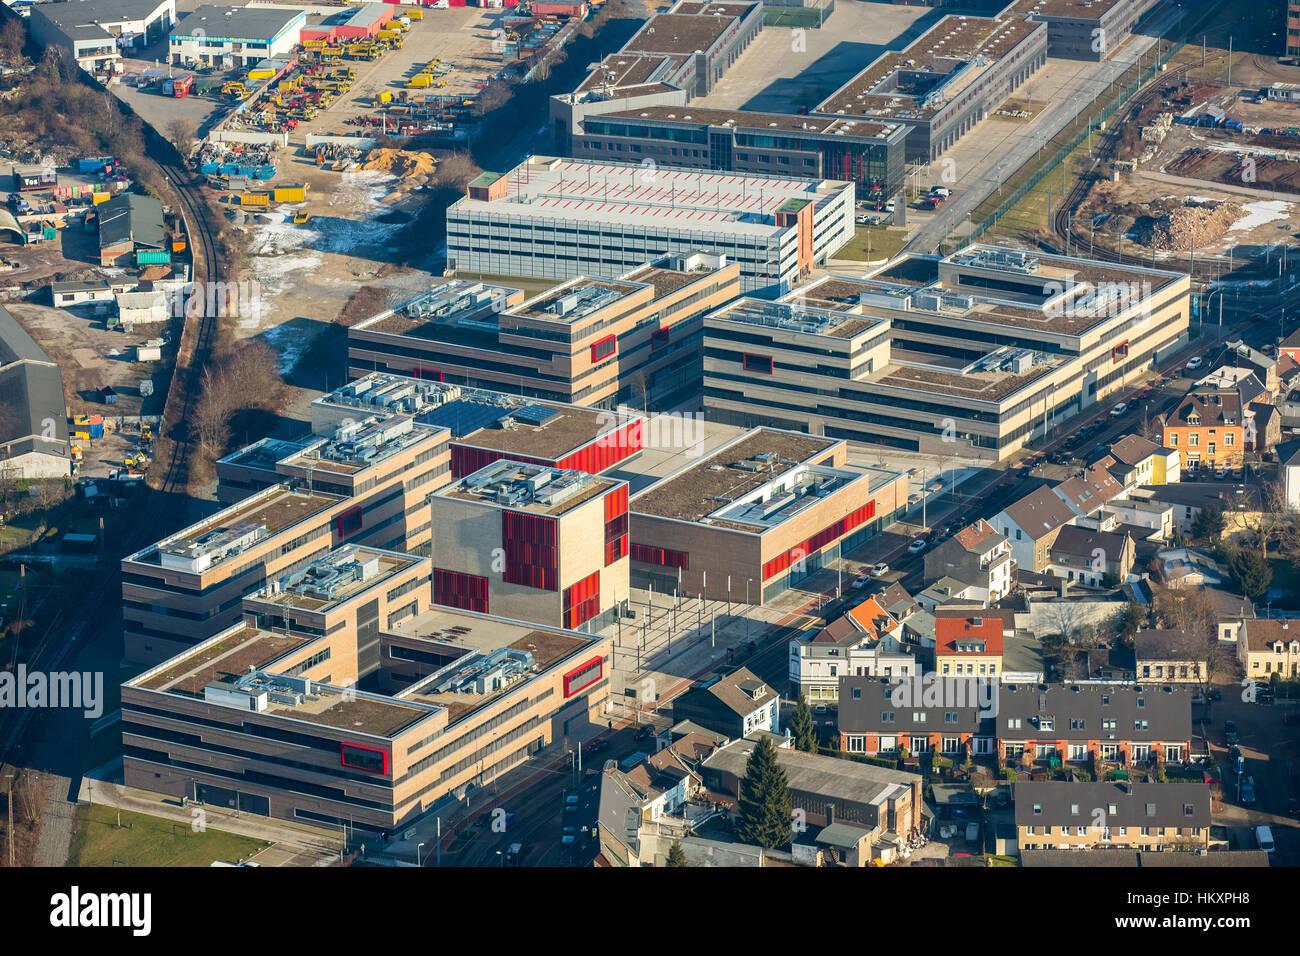 University, college, Ruhr West, campus, Mülheim, Ruhr area, North Rhine-Westphalia, Germany - Stock Image